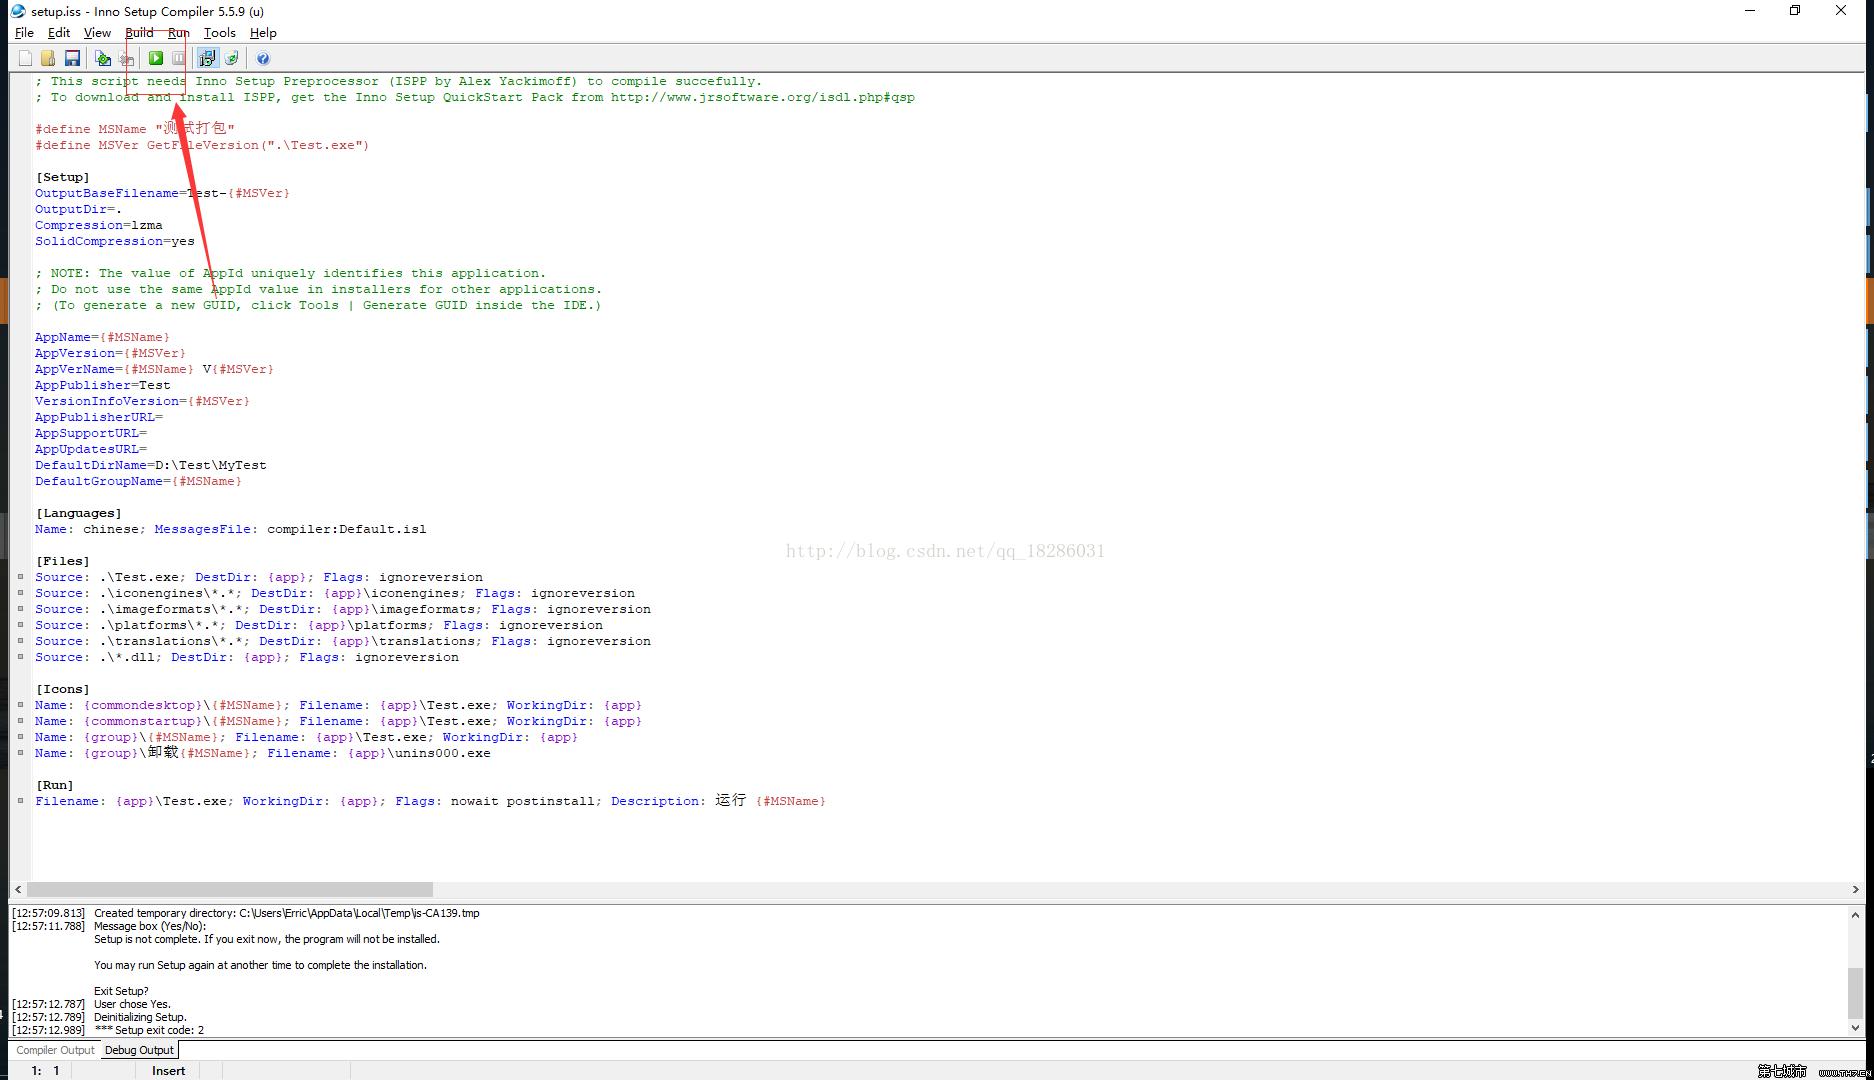 QT package - Programmer Sought